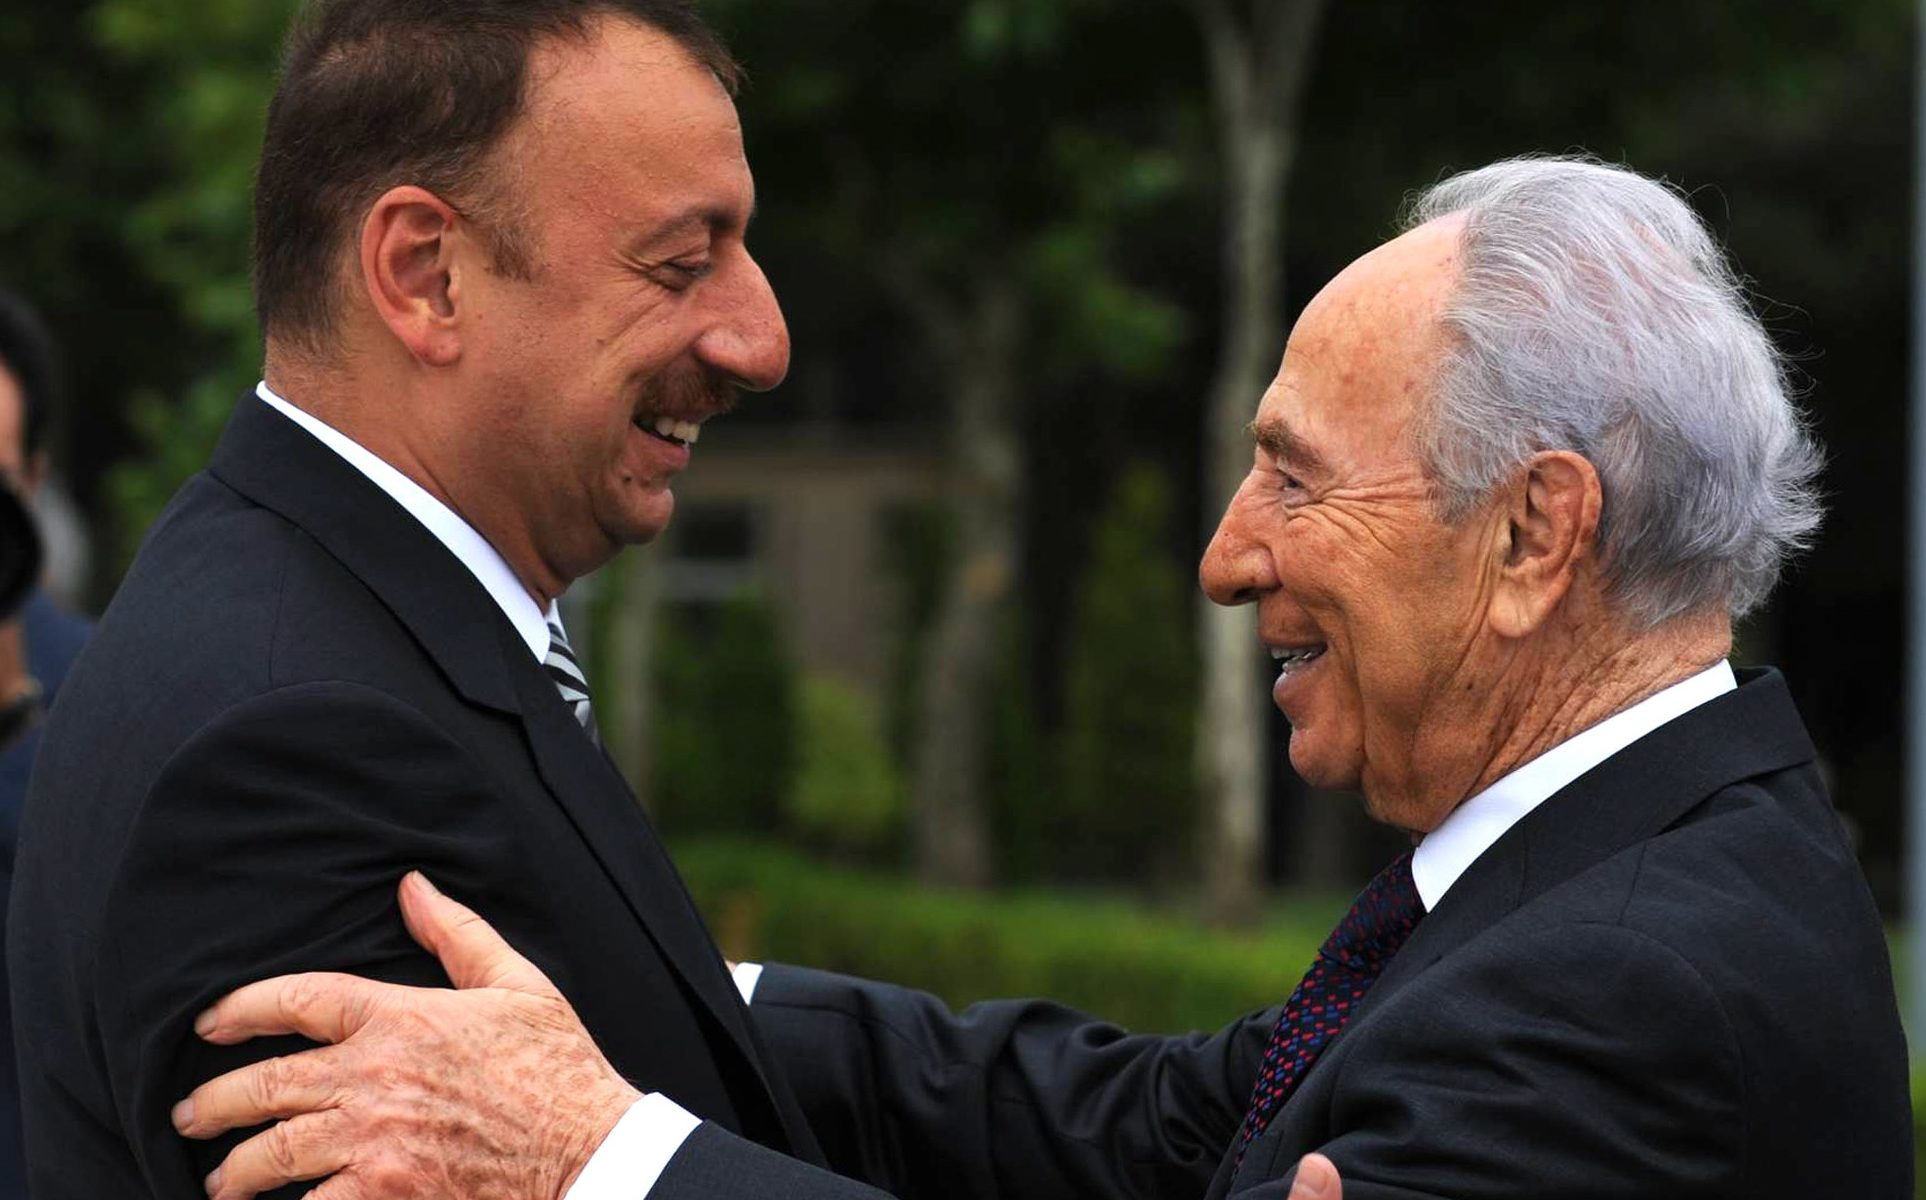 Israeli President Peres Visits Azerbaijan